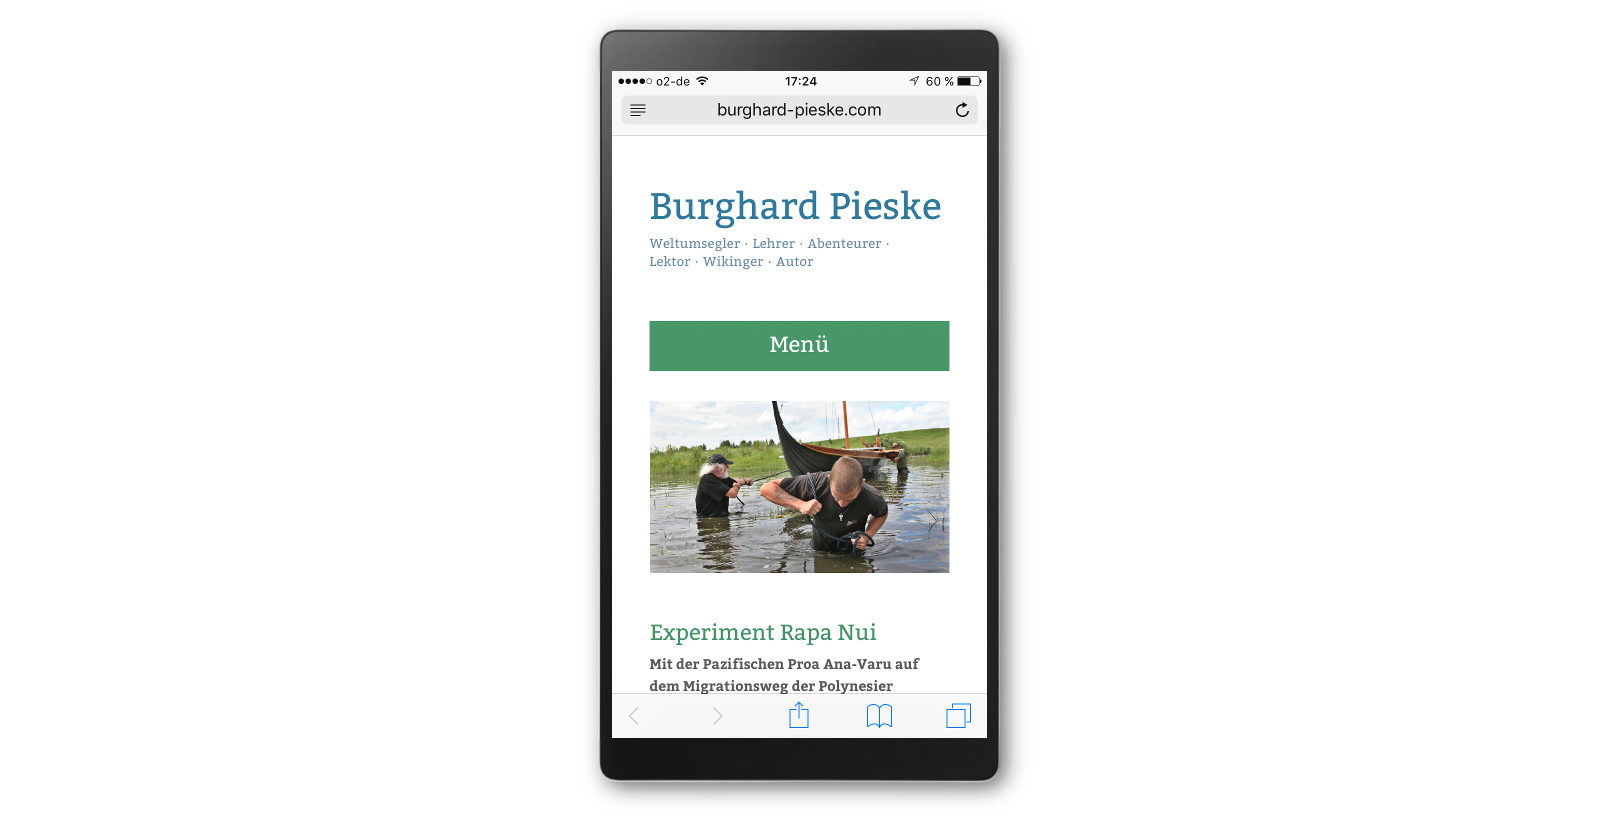 Burghard Pieske